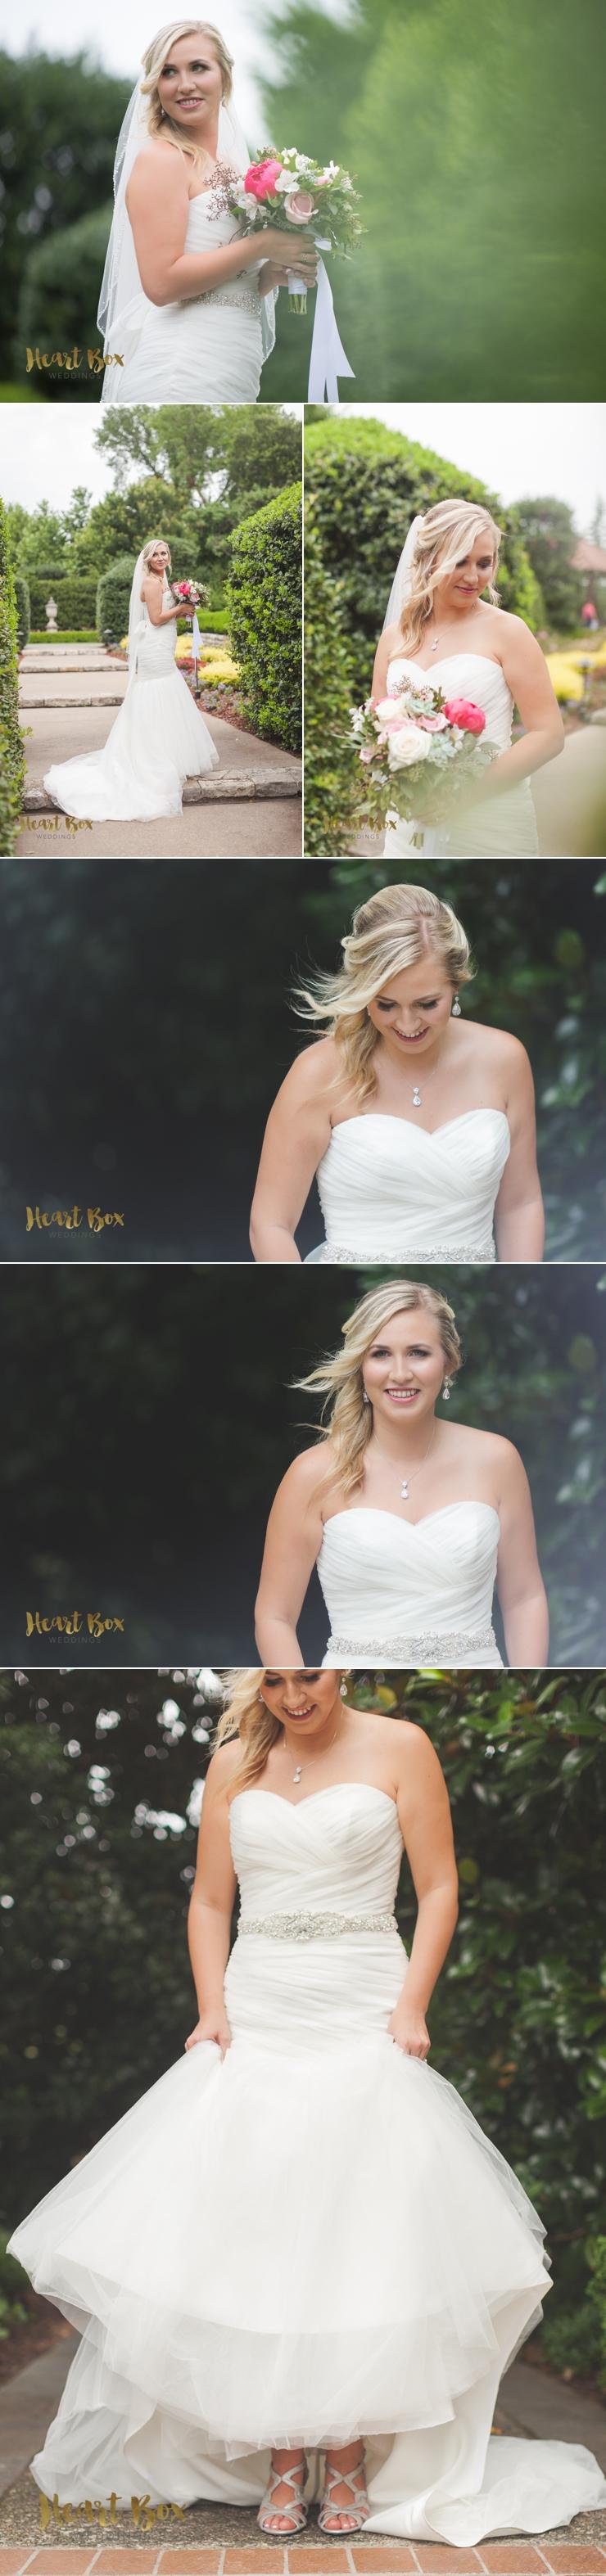 Karlee Bridal Blog Collages 5.jpg